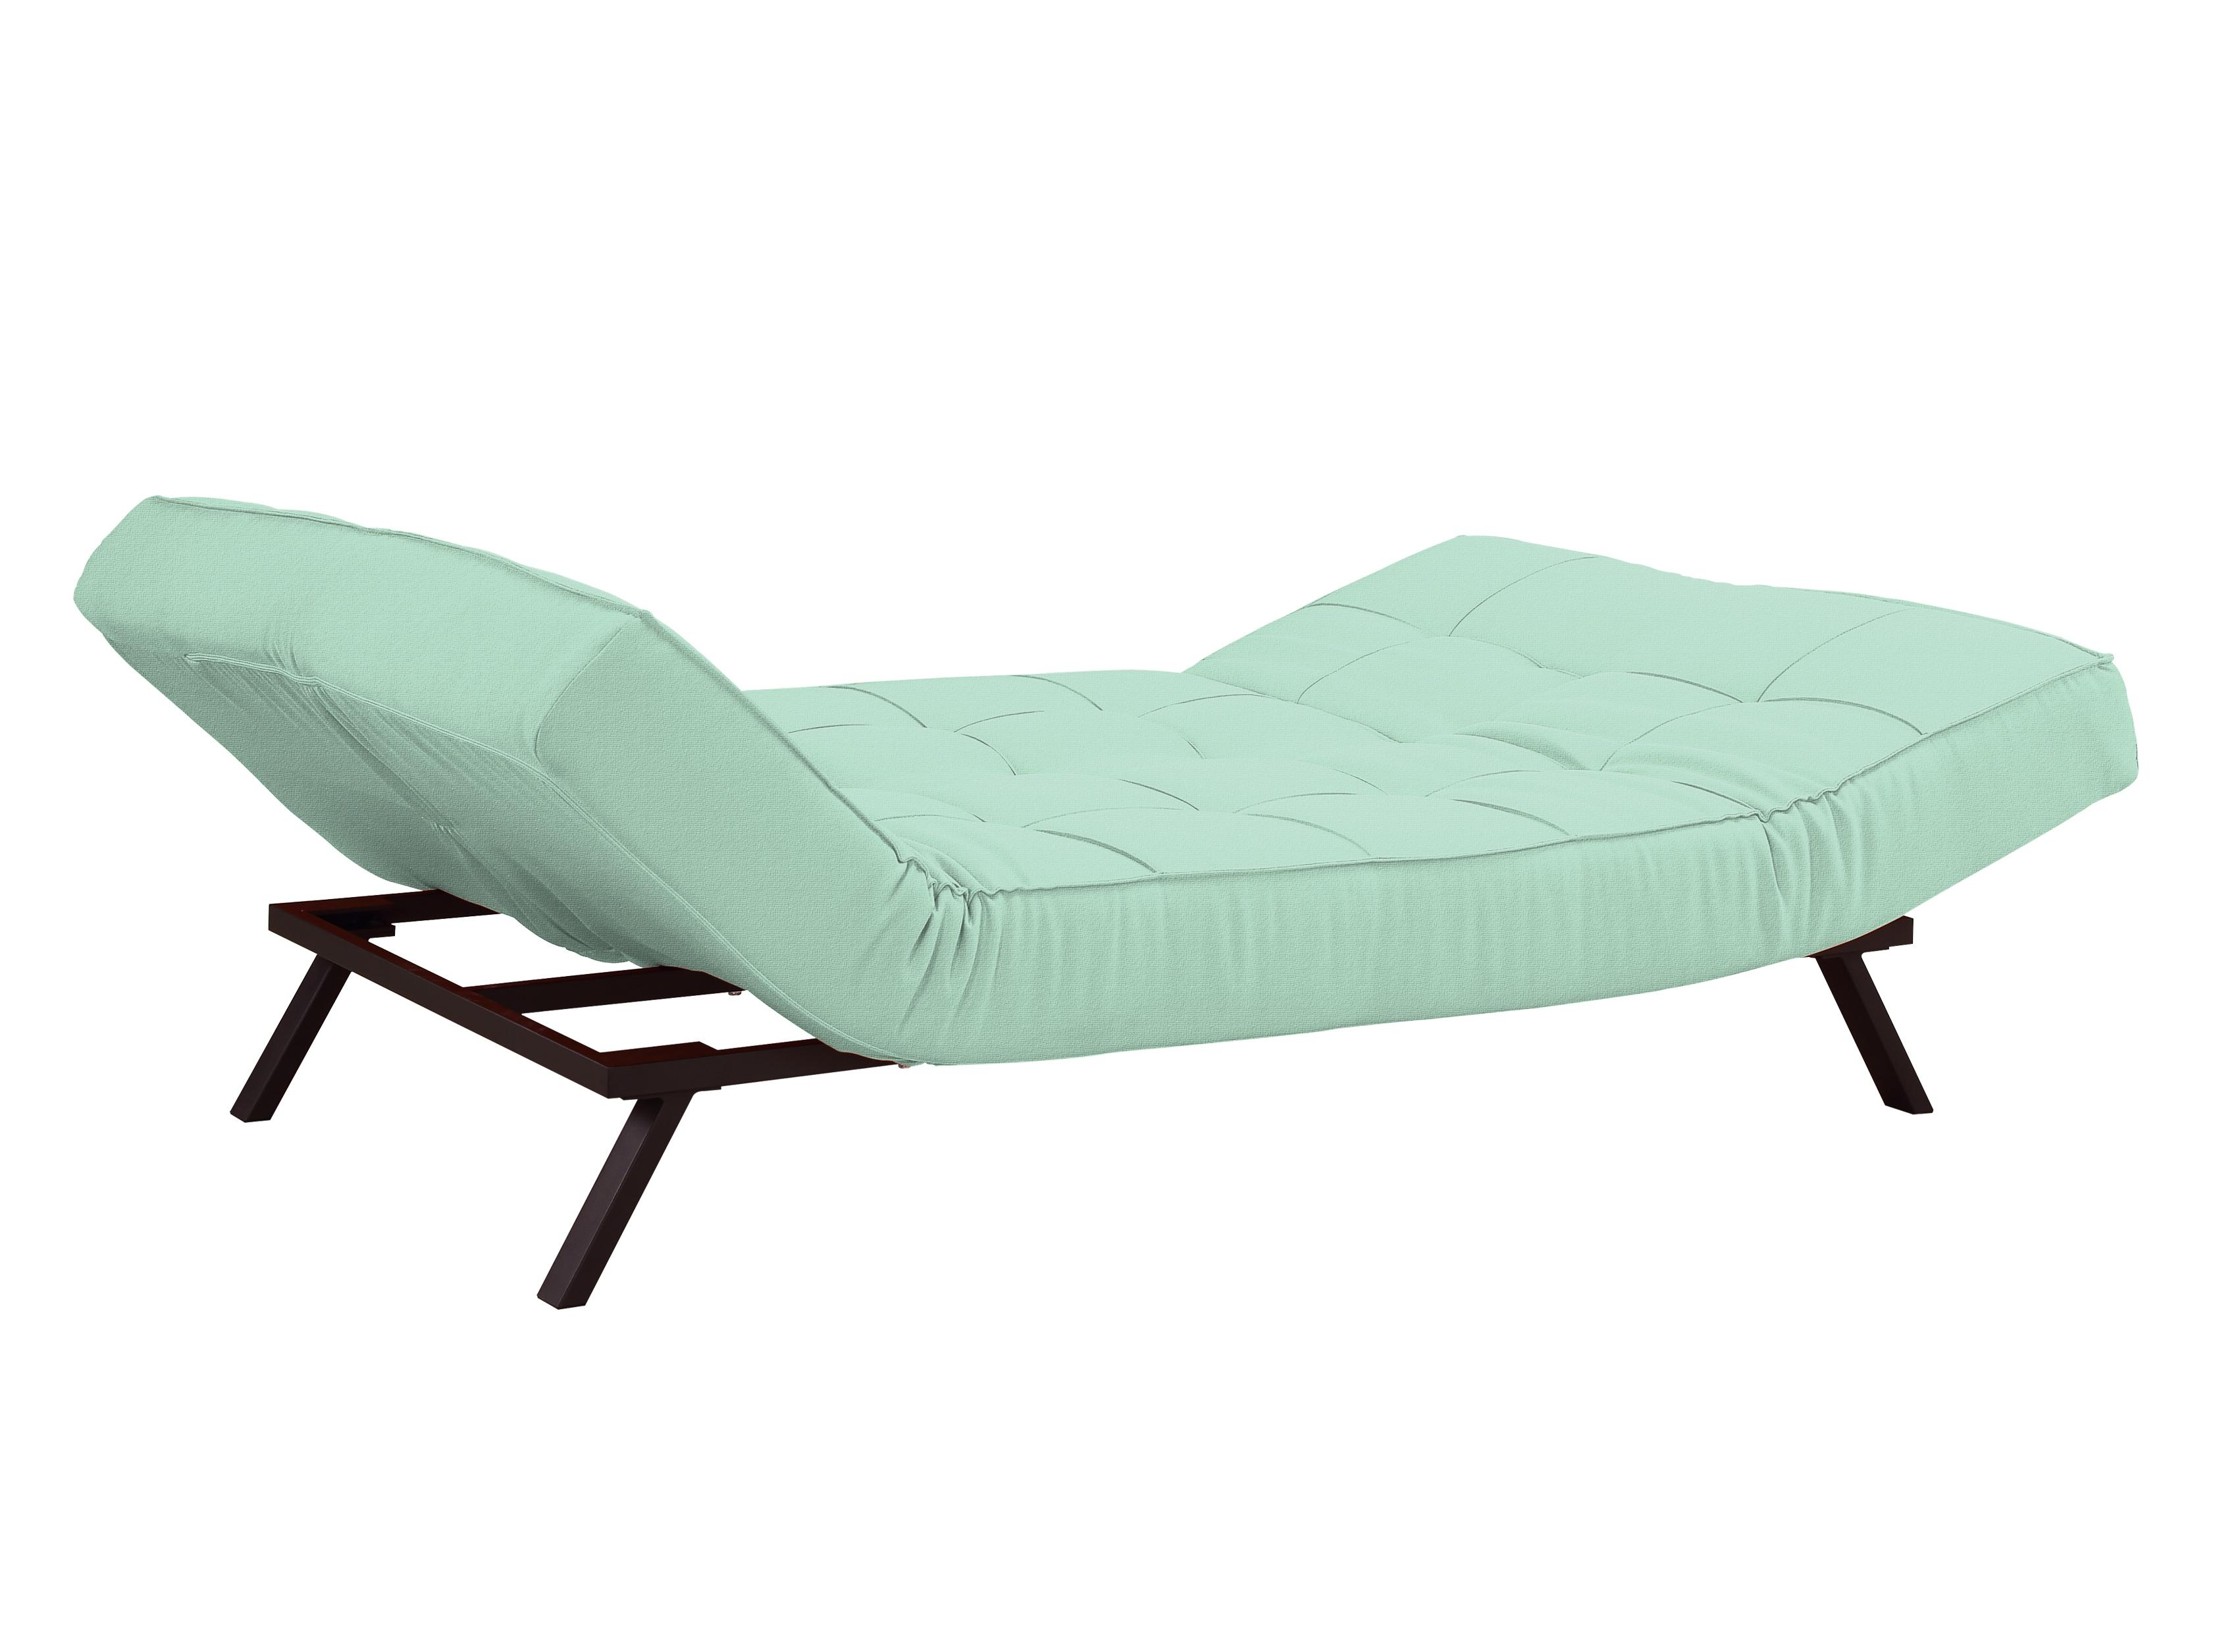 Copa Convertible Sofa Sea Foam Greenserta / Lifestyle Intended For Seafoam Green Sofas (View 18 of 20)